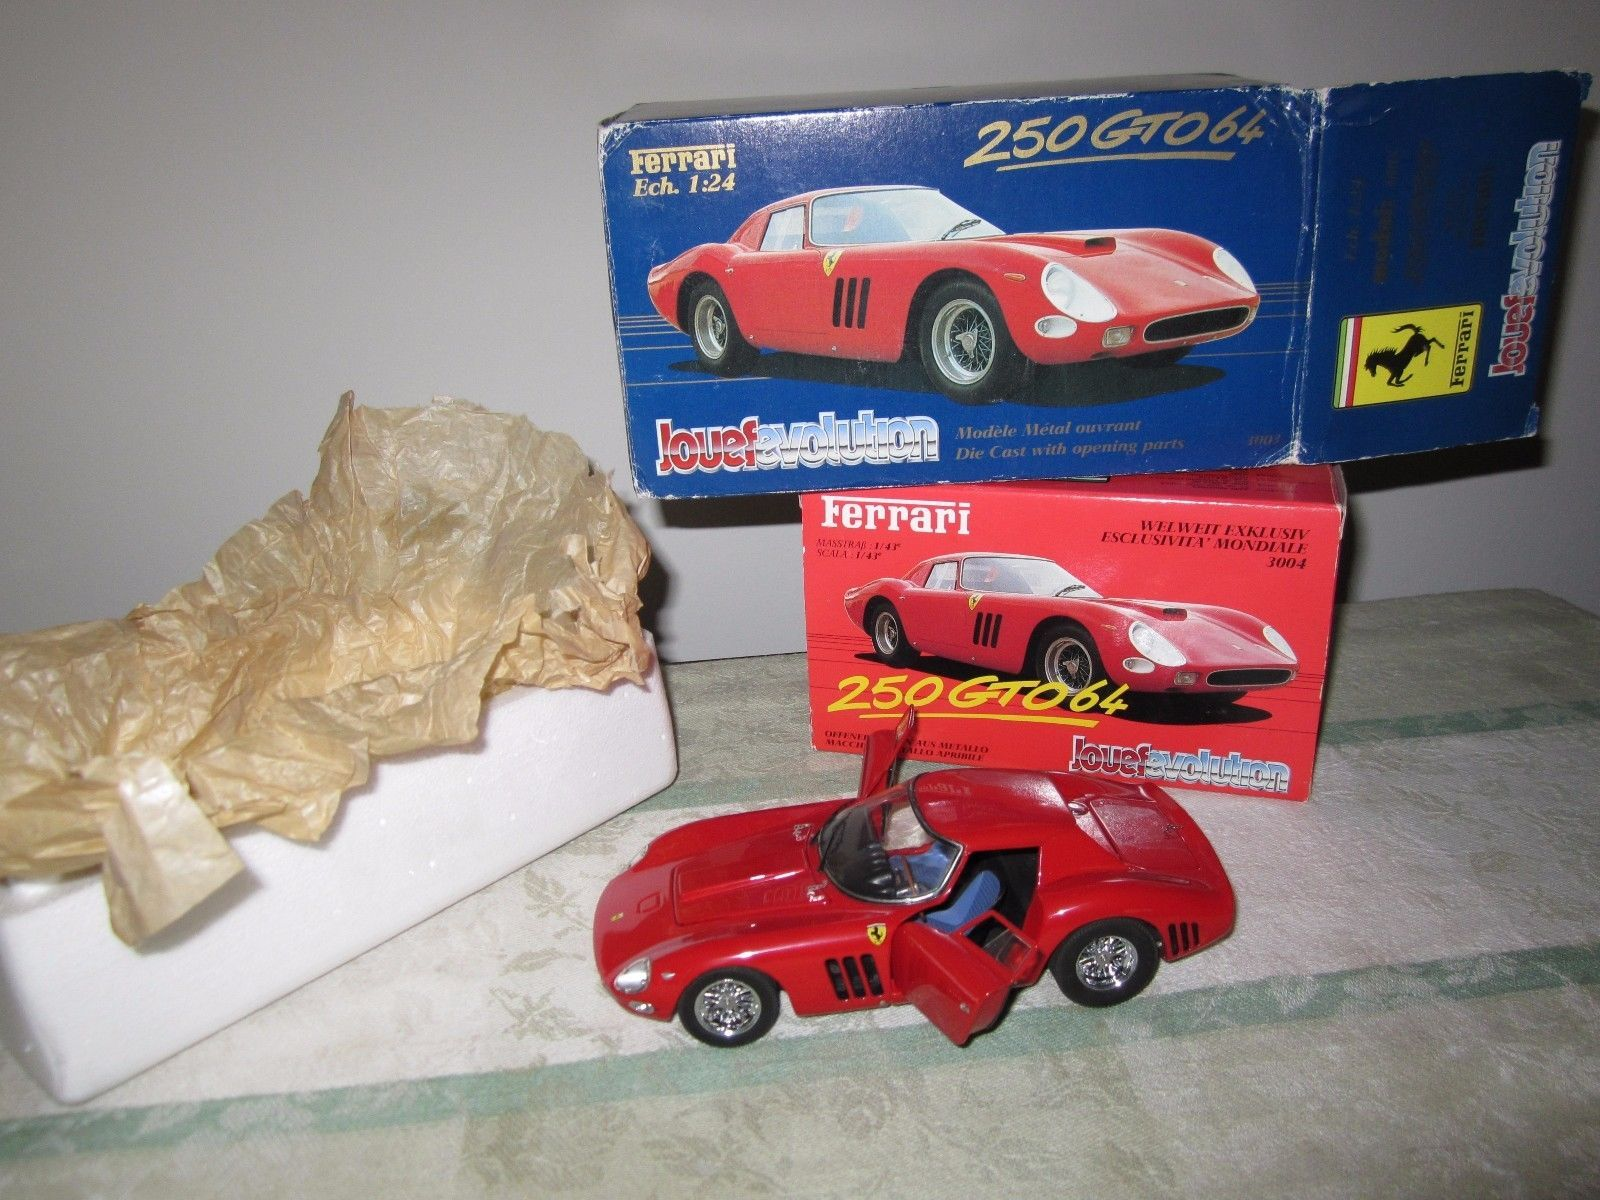 2 Jouef Evolution Ferrari 250 Gto 1964 124 143 Scale Diecast Wiring Harness Radio